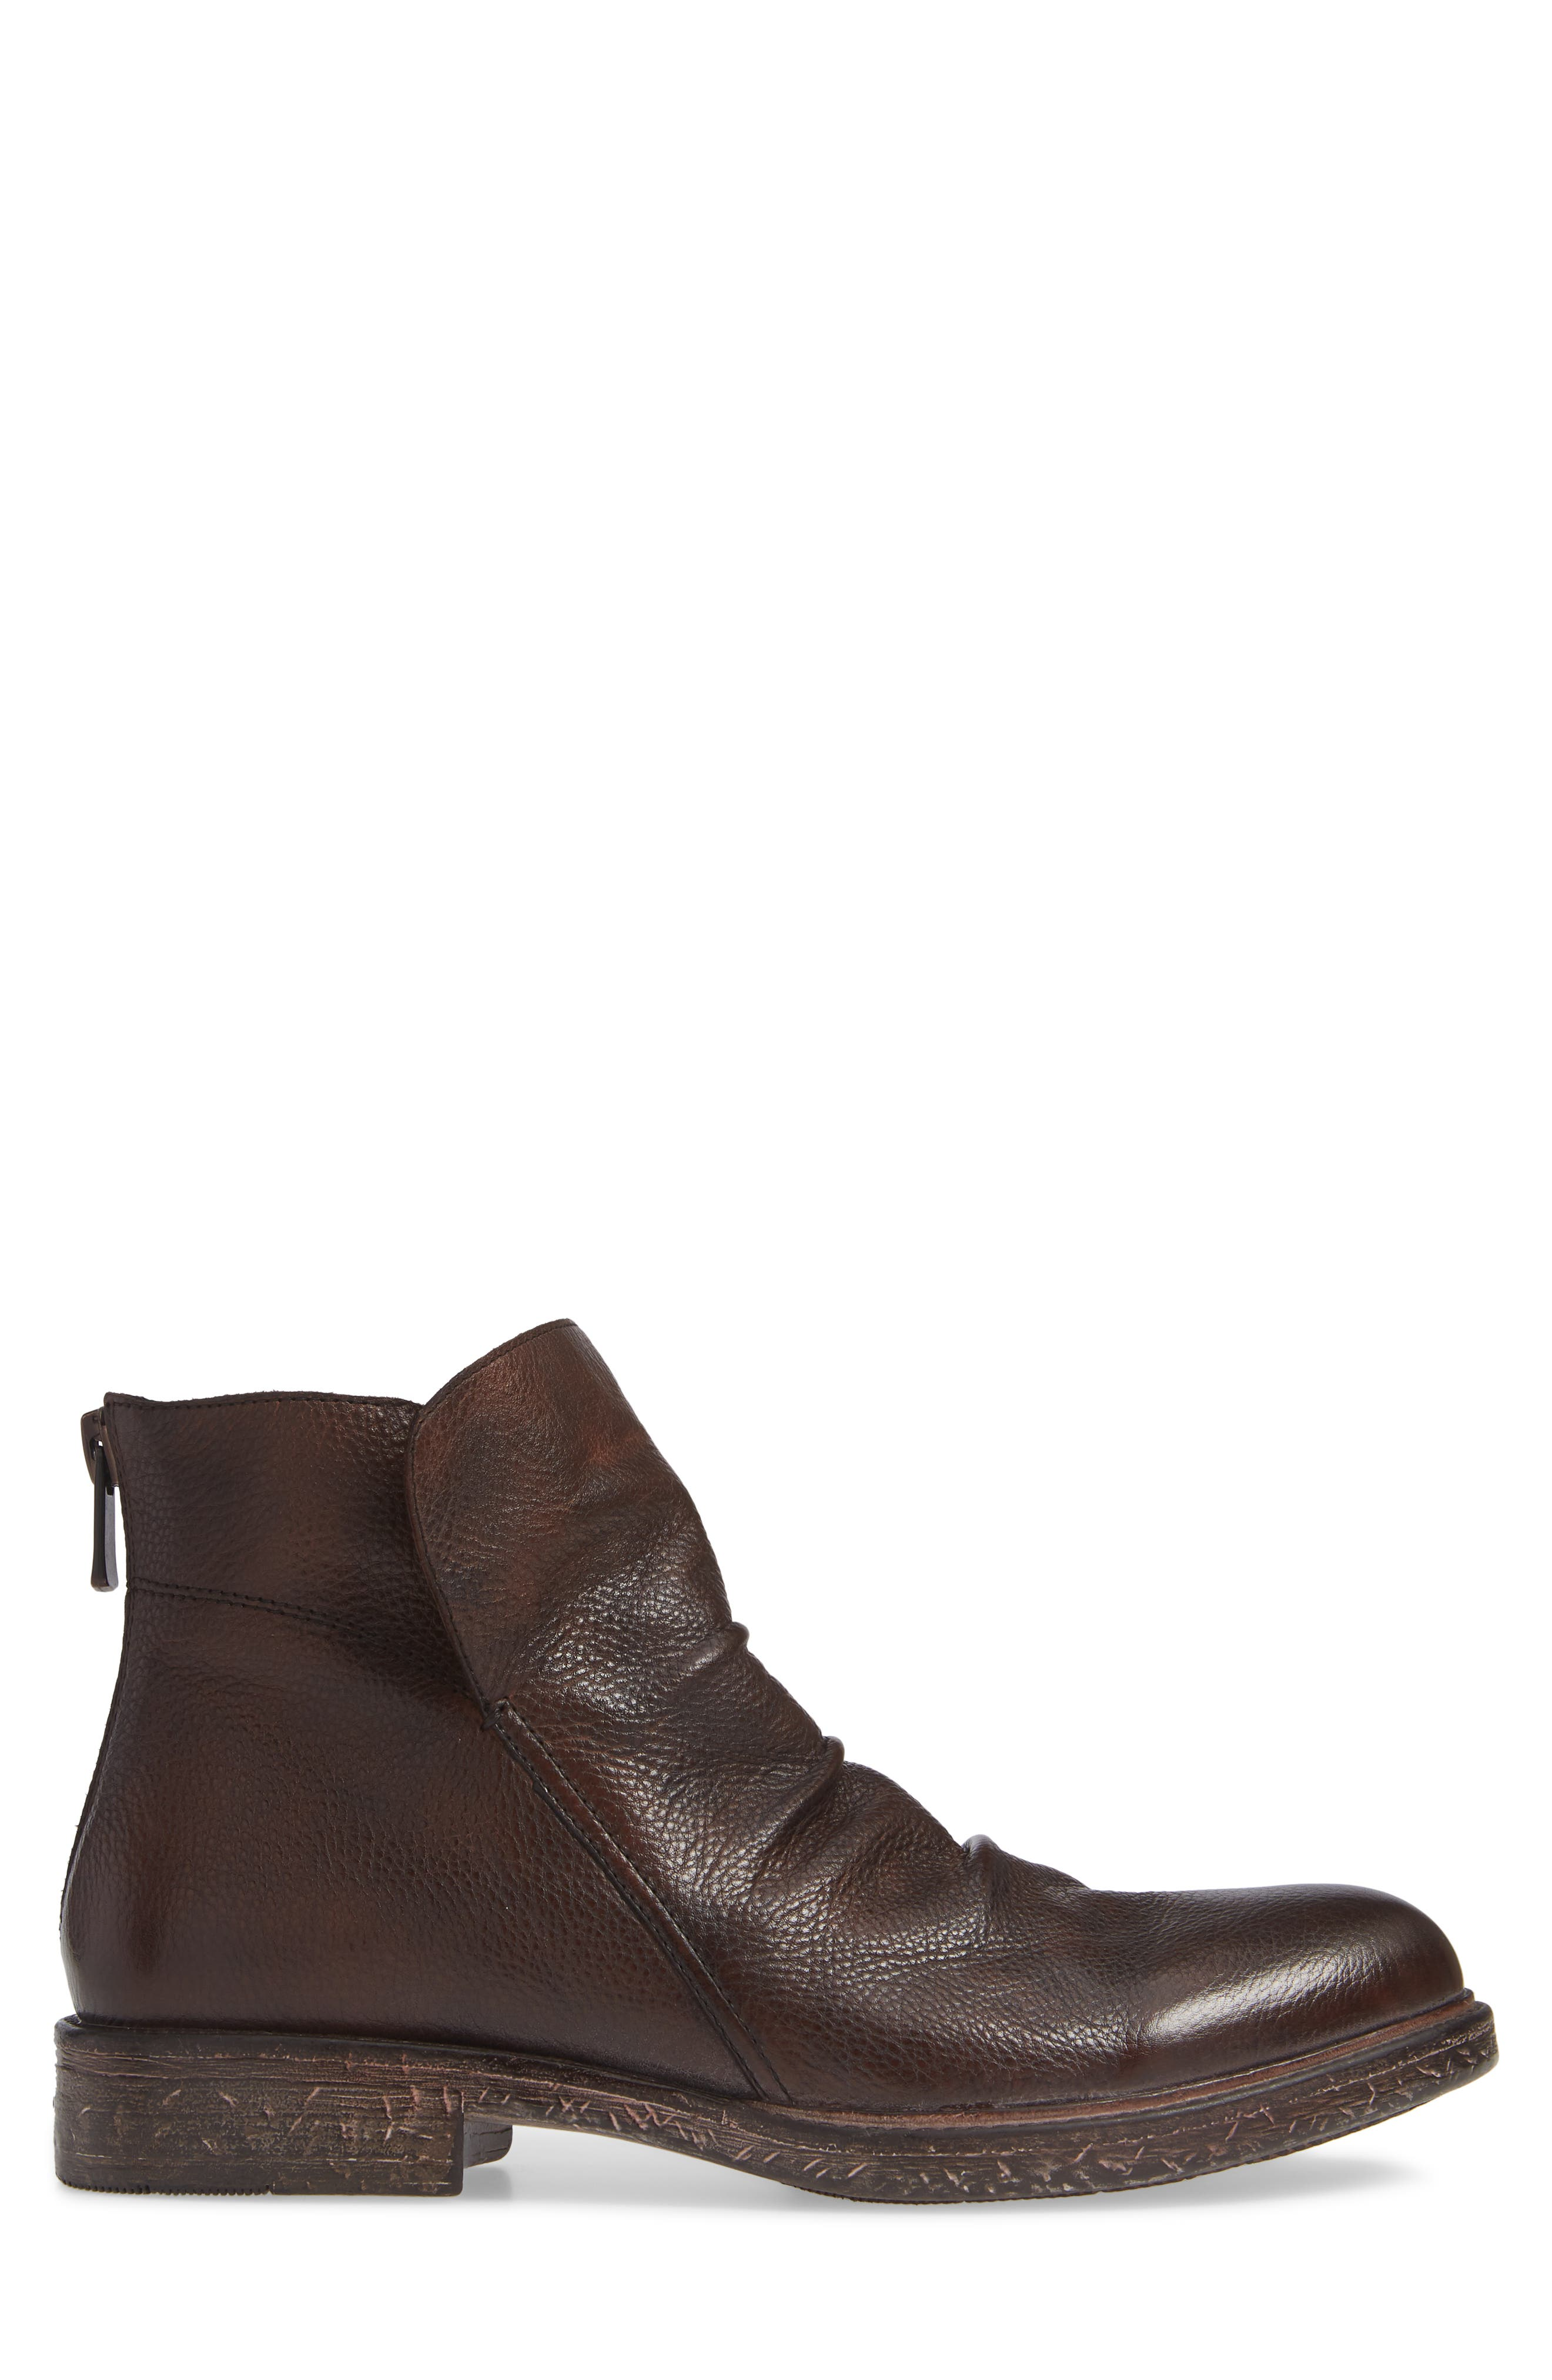 JUMP, Pueblo Slouchy Boot, Alternate thumbnail 3, color, BROWN